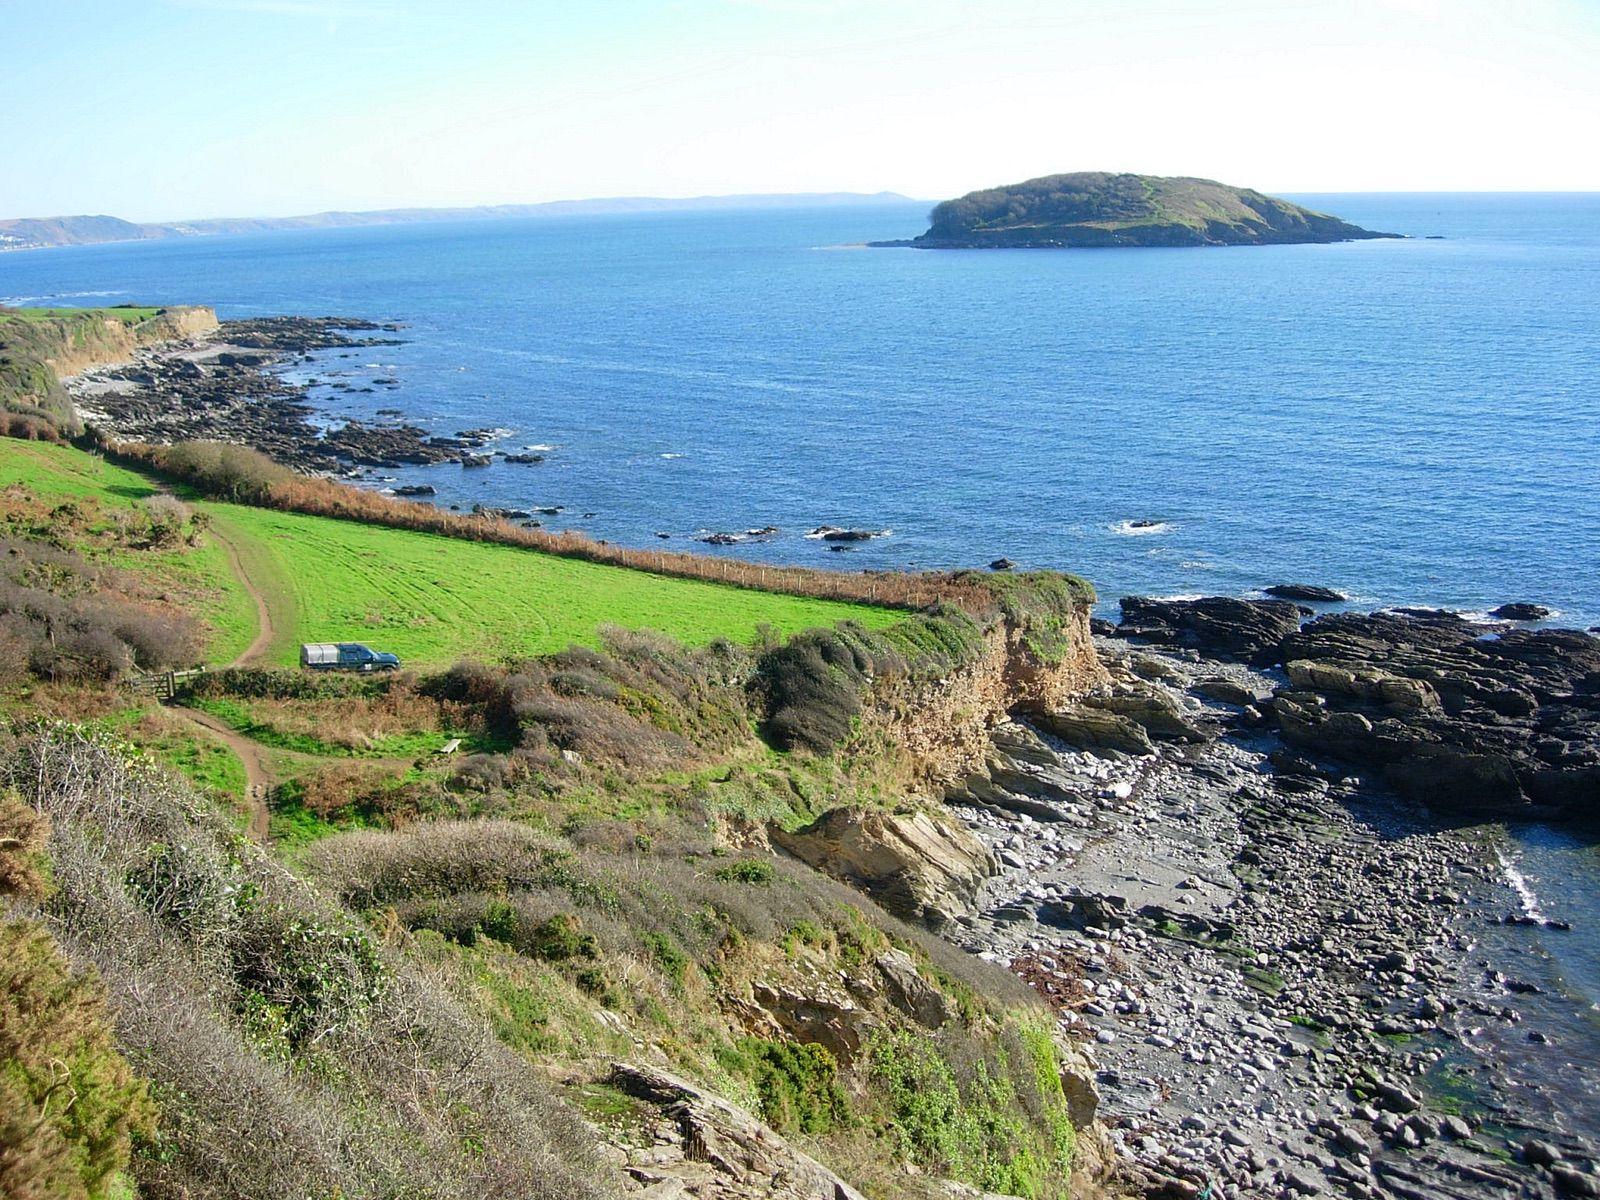 Looe to Polperro Walk - view Looe Island from South West Coast Path